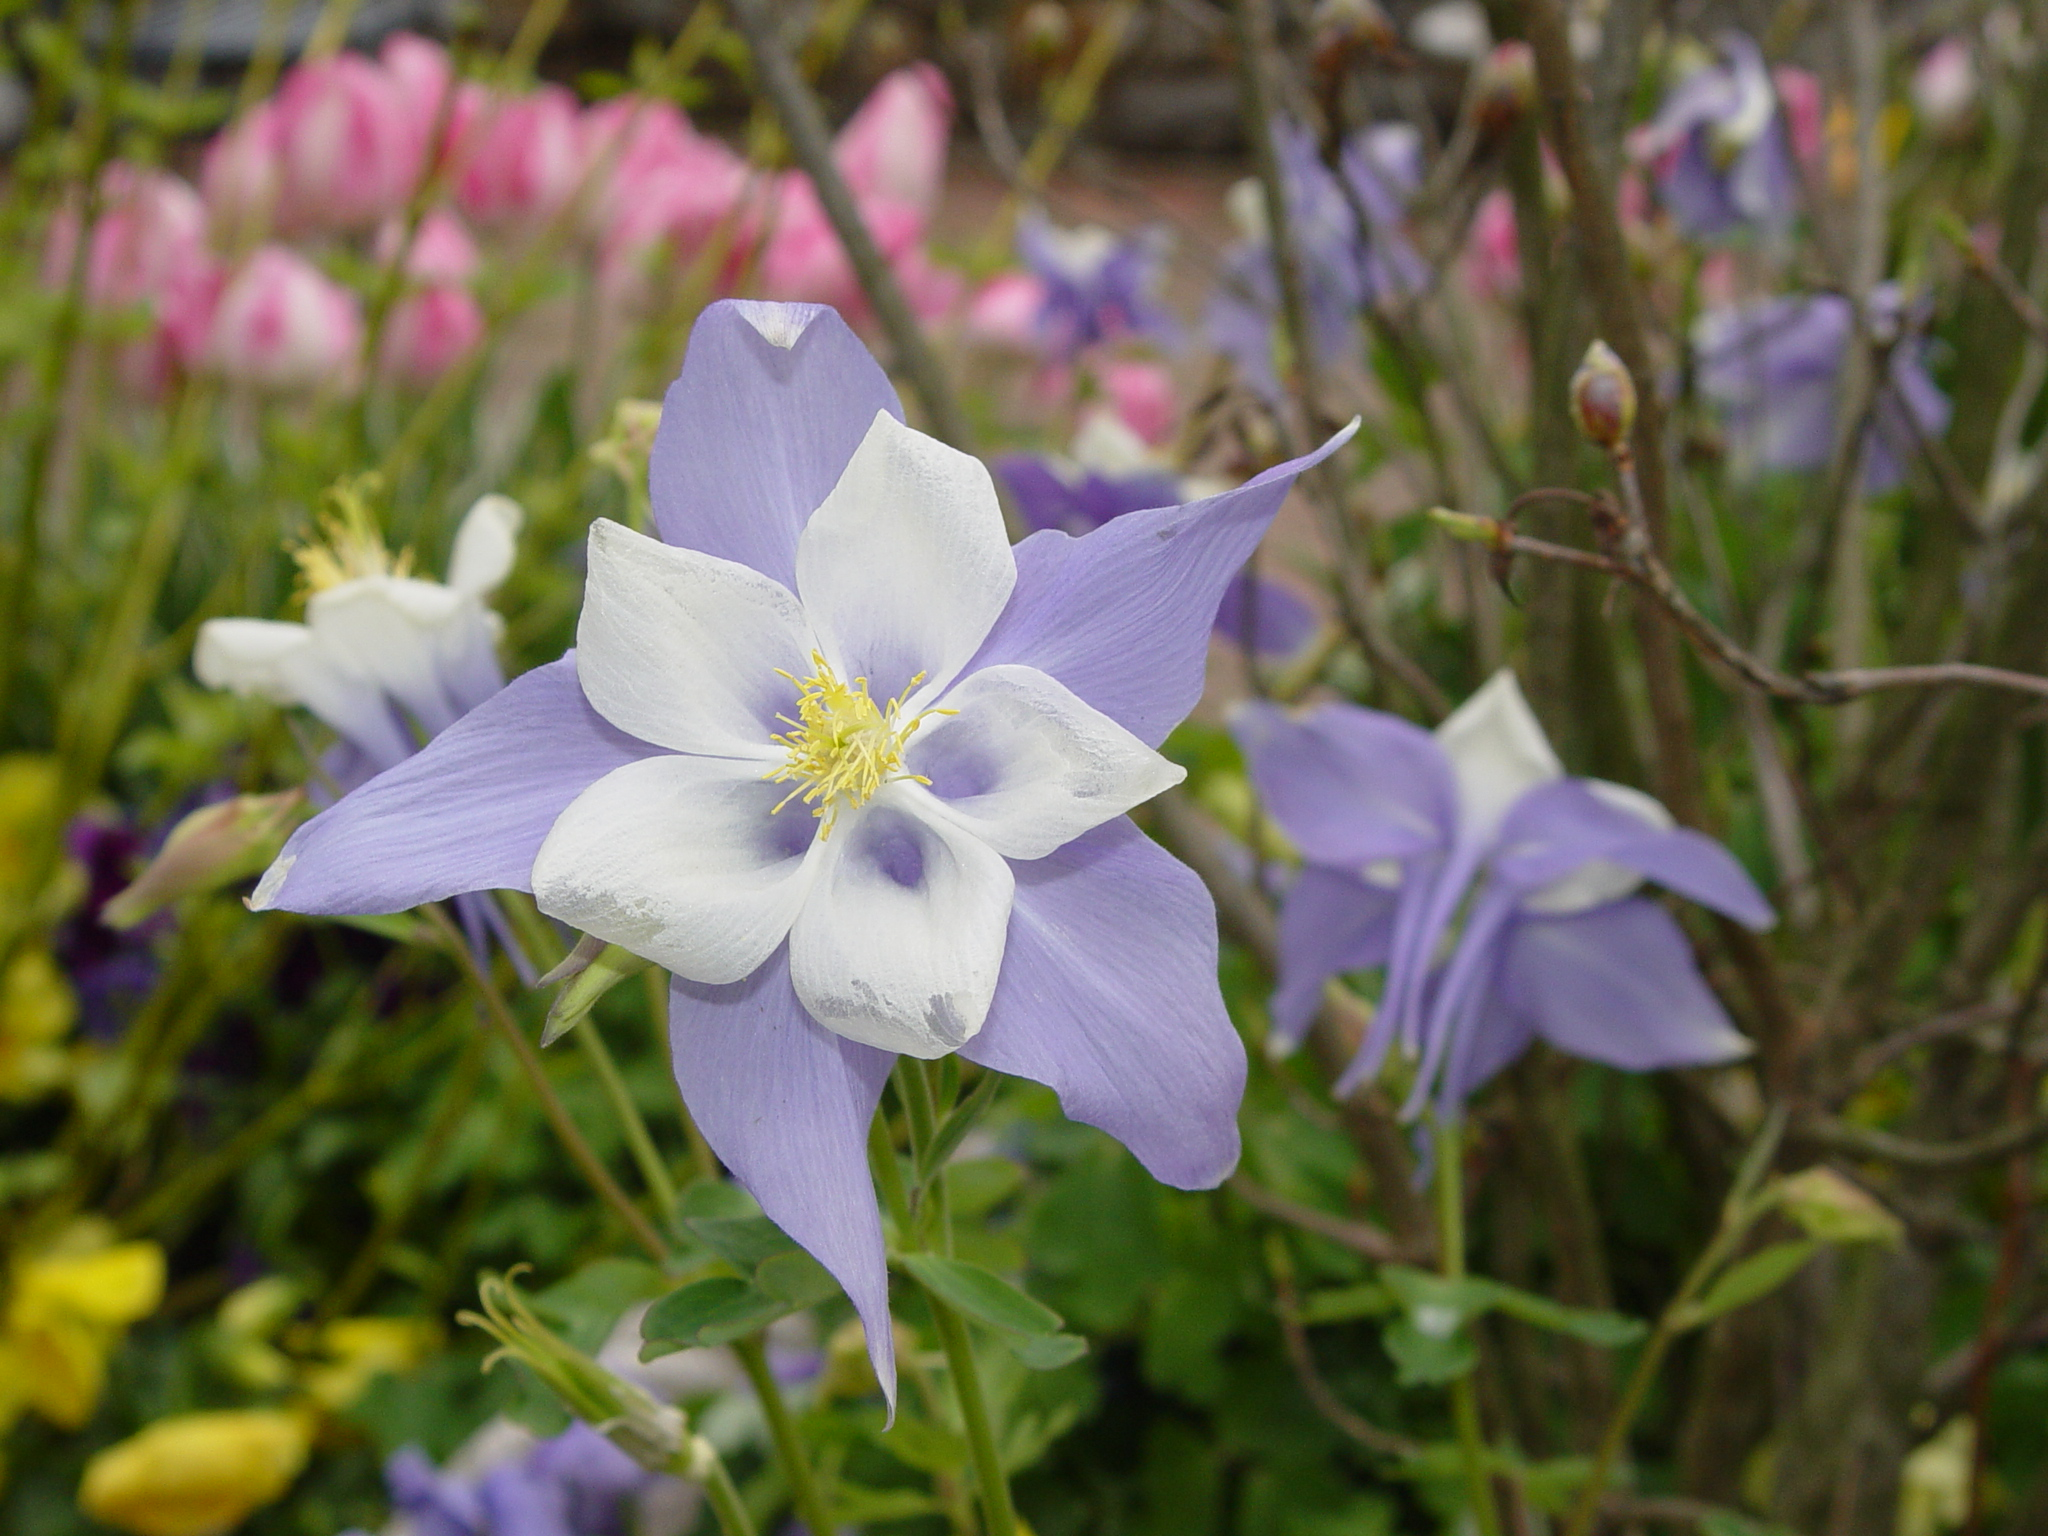 Colorado blue columbine aquilegia caerulea pics4learning colorado blue columbine aquilegia caerulea dhlflorist Image collections